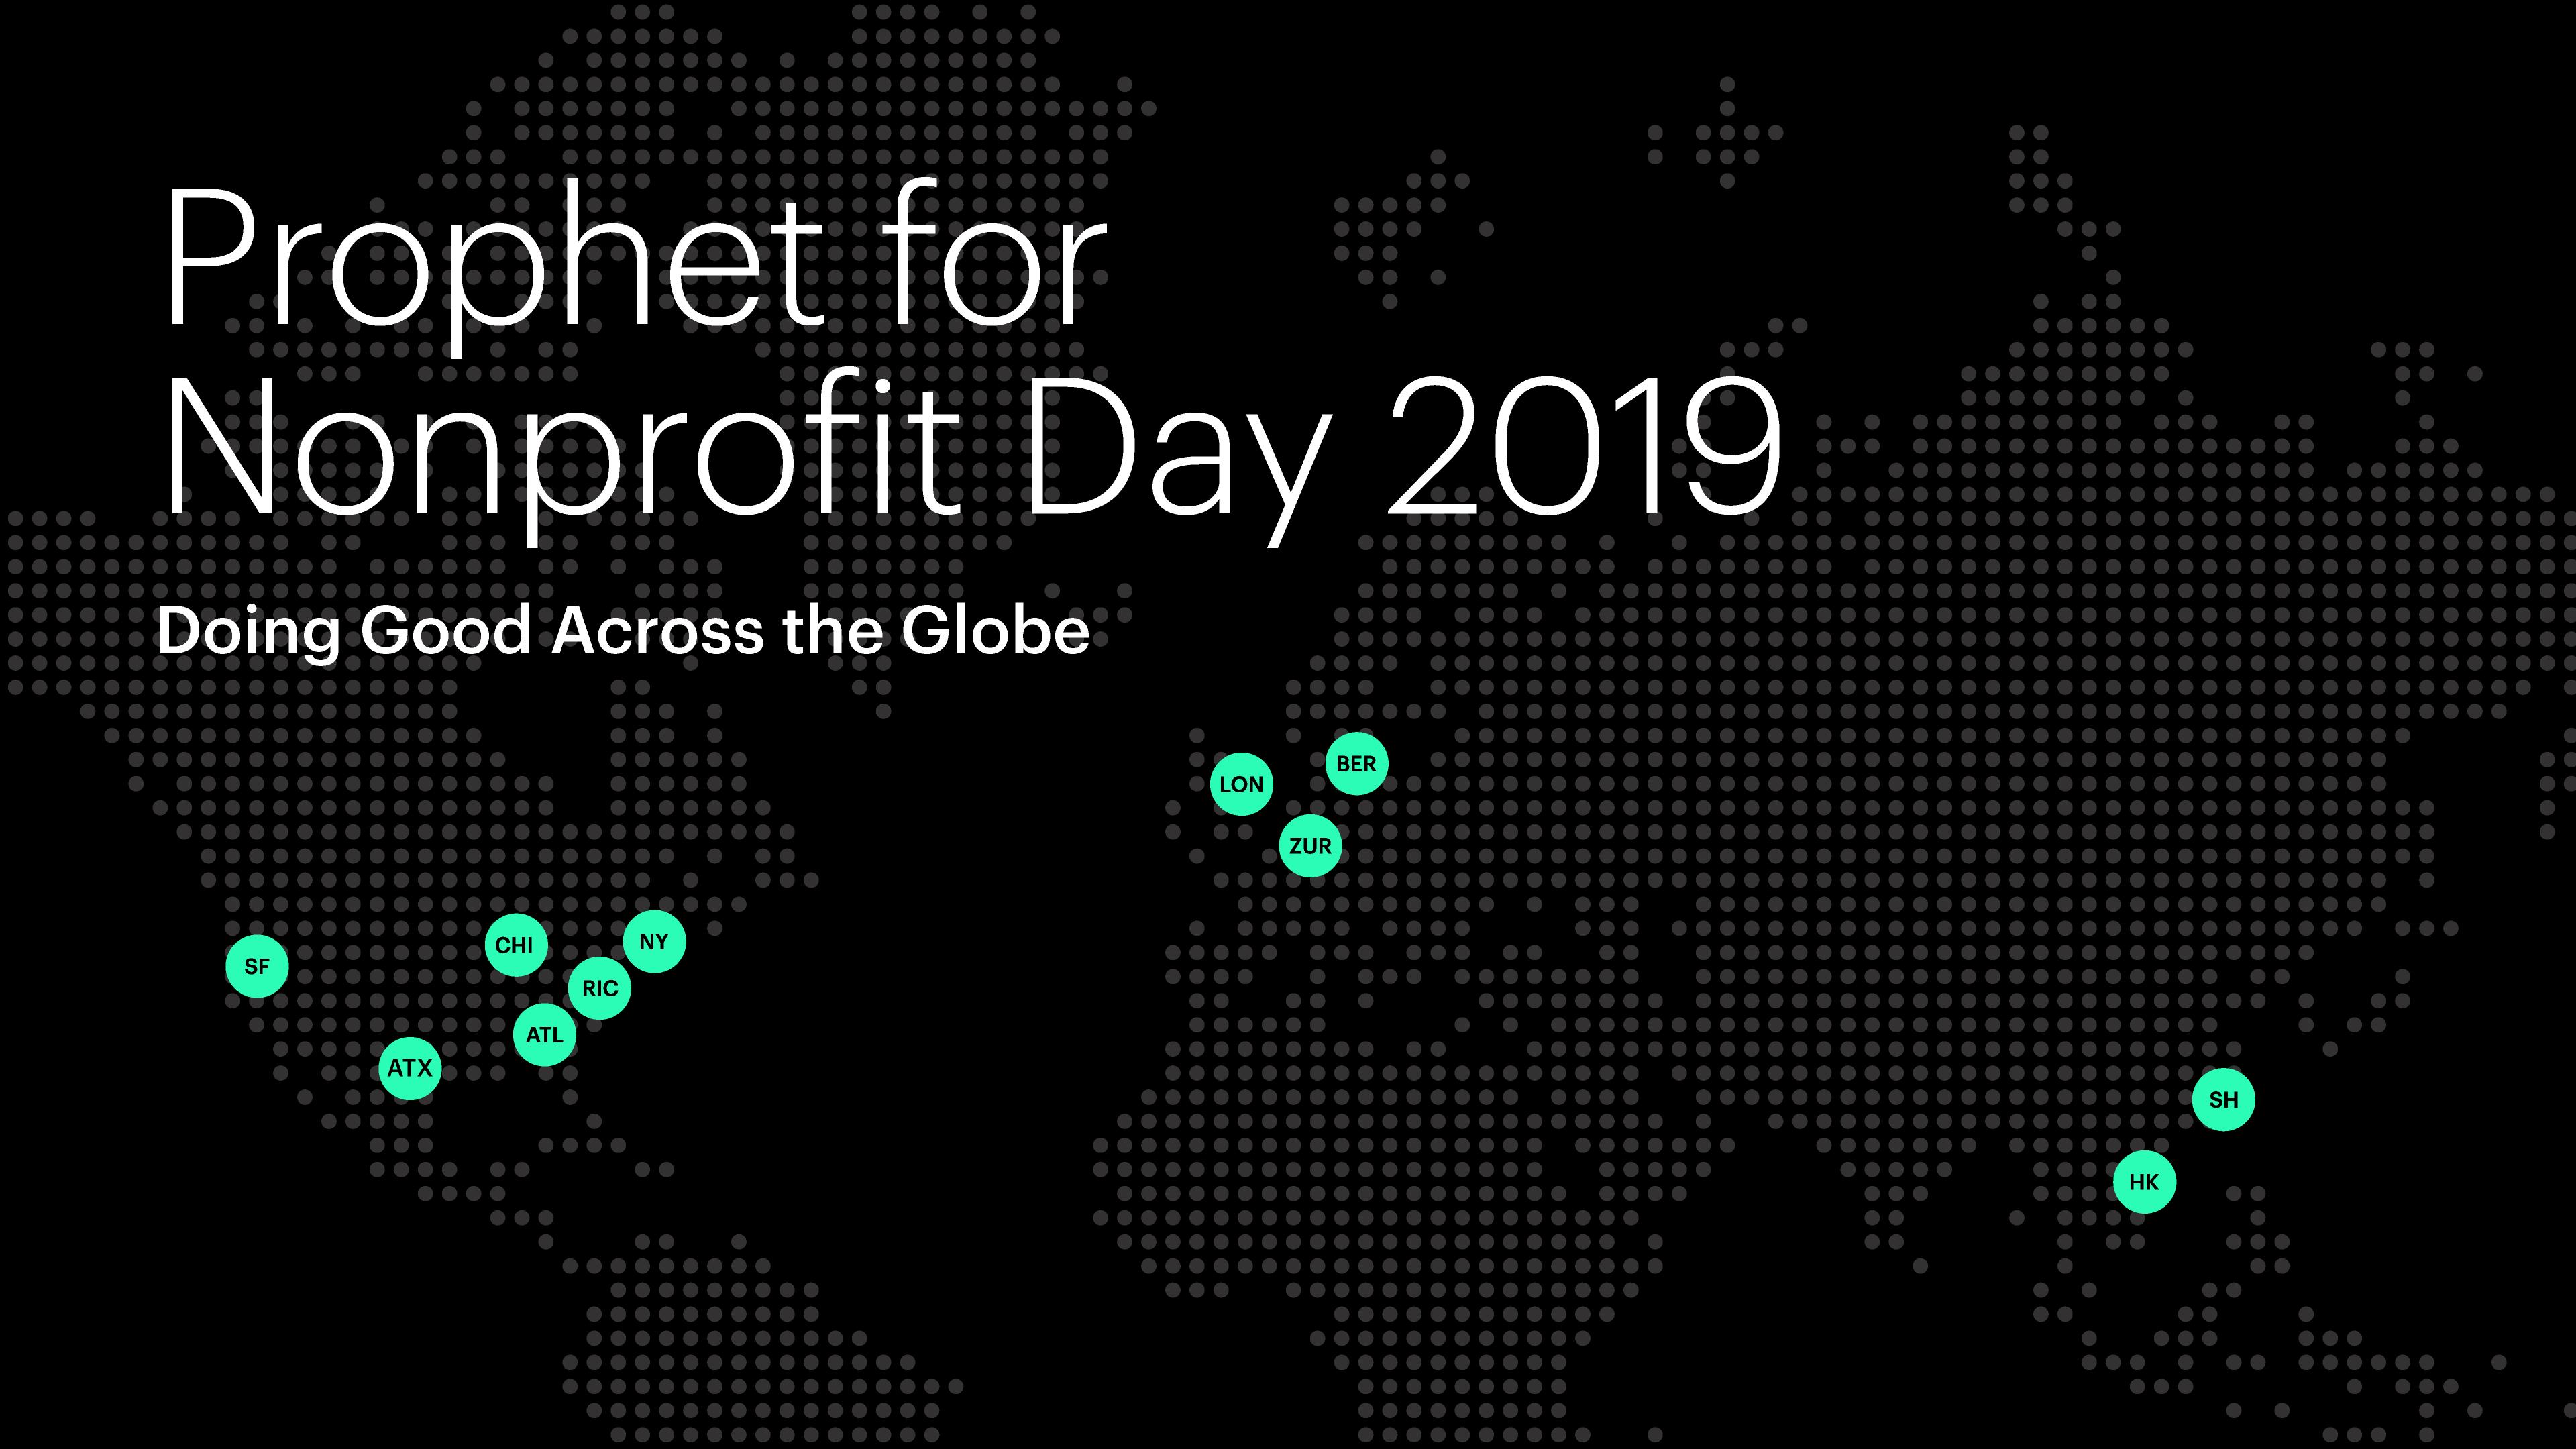 Prophet for Nonprofit Day 2019